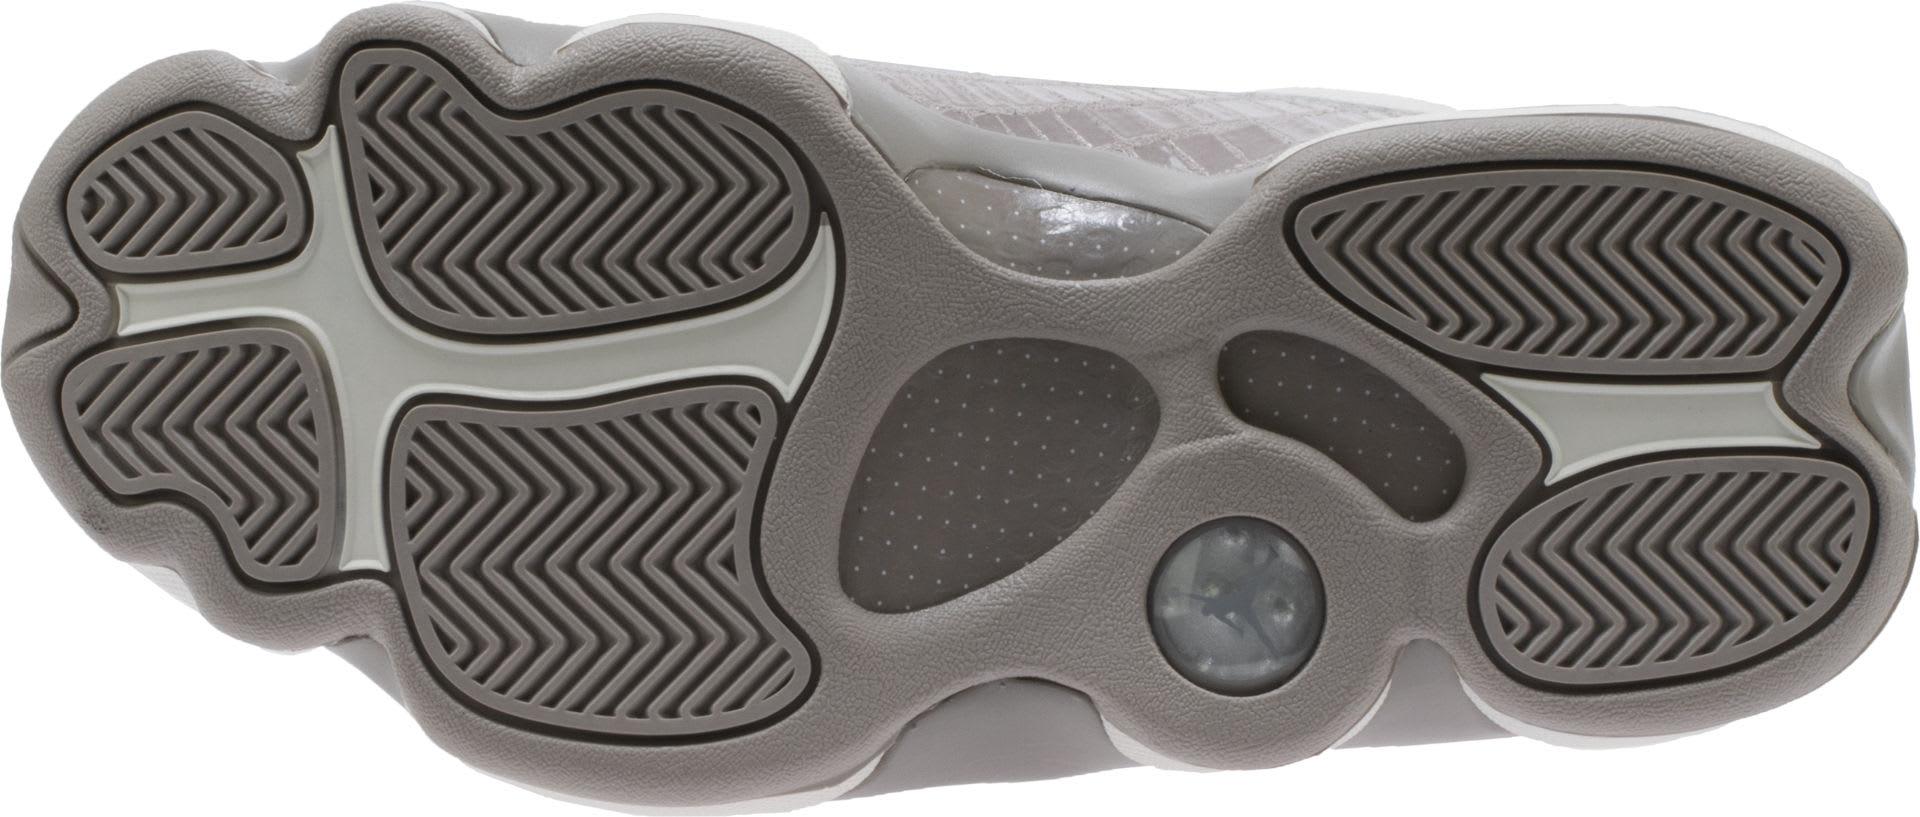 Air Jordan 13 Women's 'Phantom/Moon Particle' Croc AQ1757-004 (Sole)